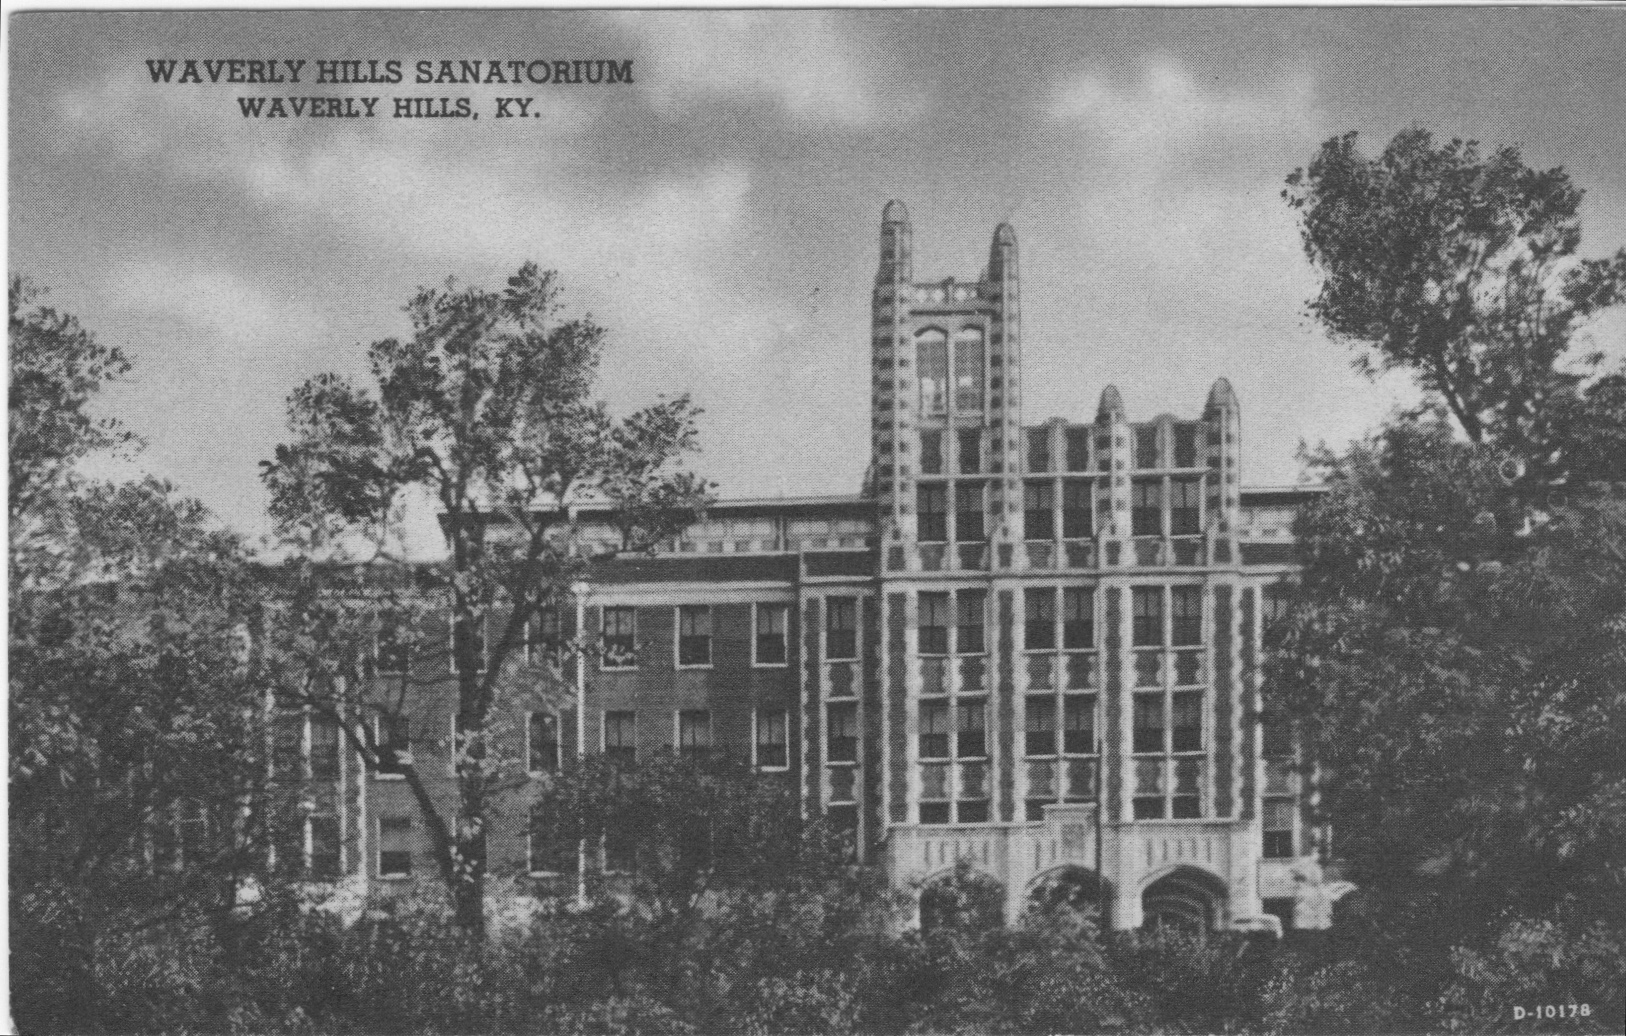 Photo Courtesy of Waverly Hills Historical Society